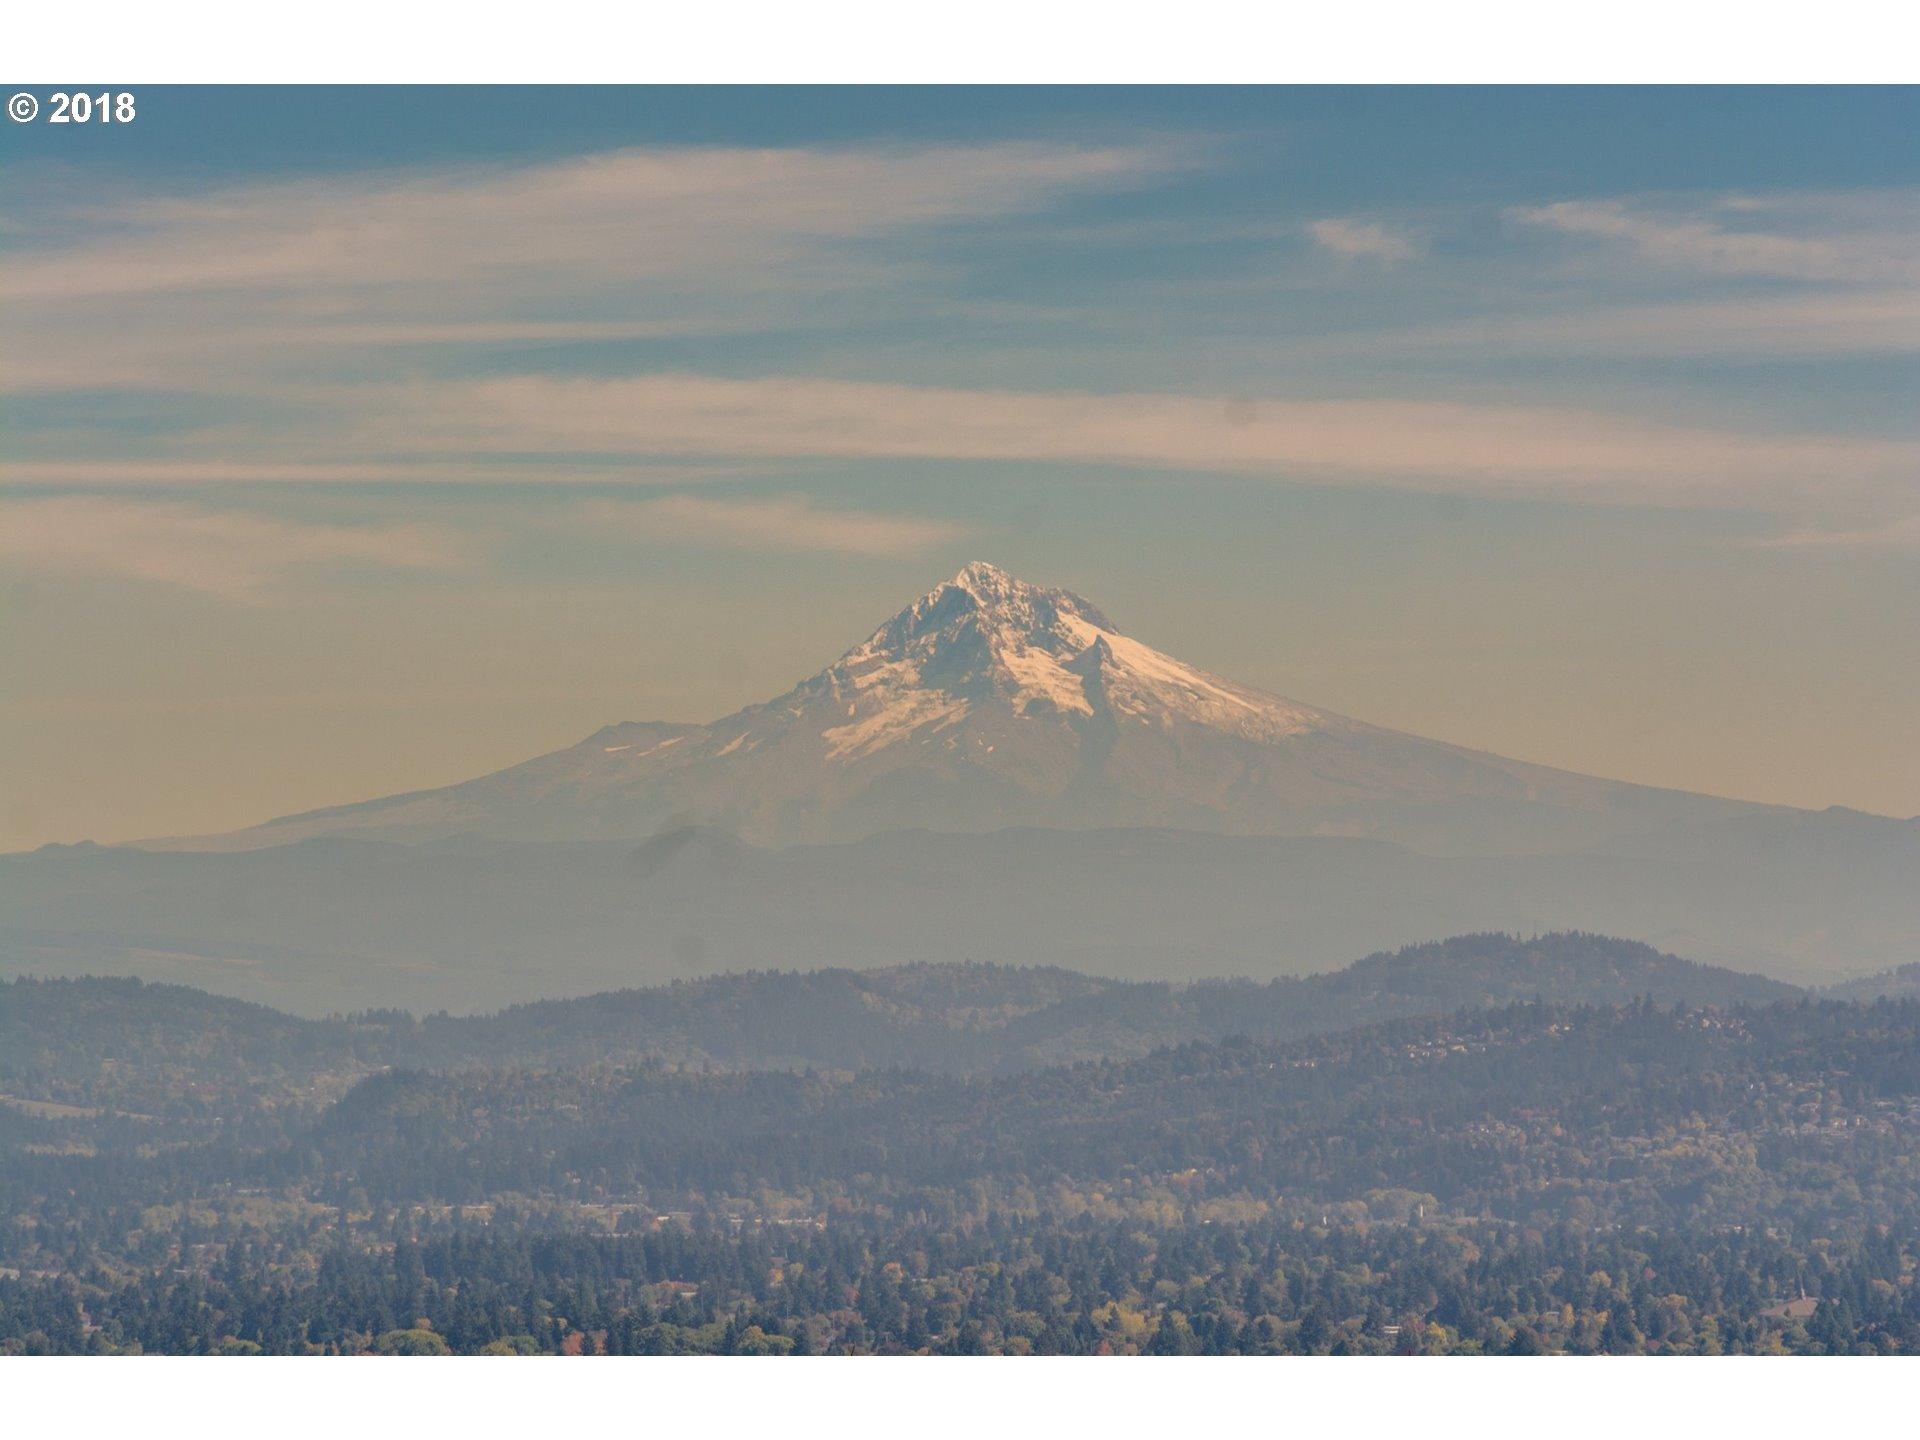 3058 SW FAIRMOUNT BLVD Portland, OR 97239 - MLS #: 18633480